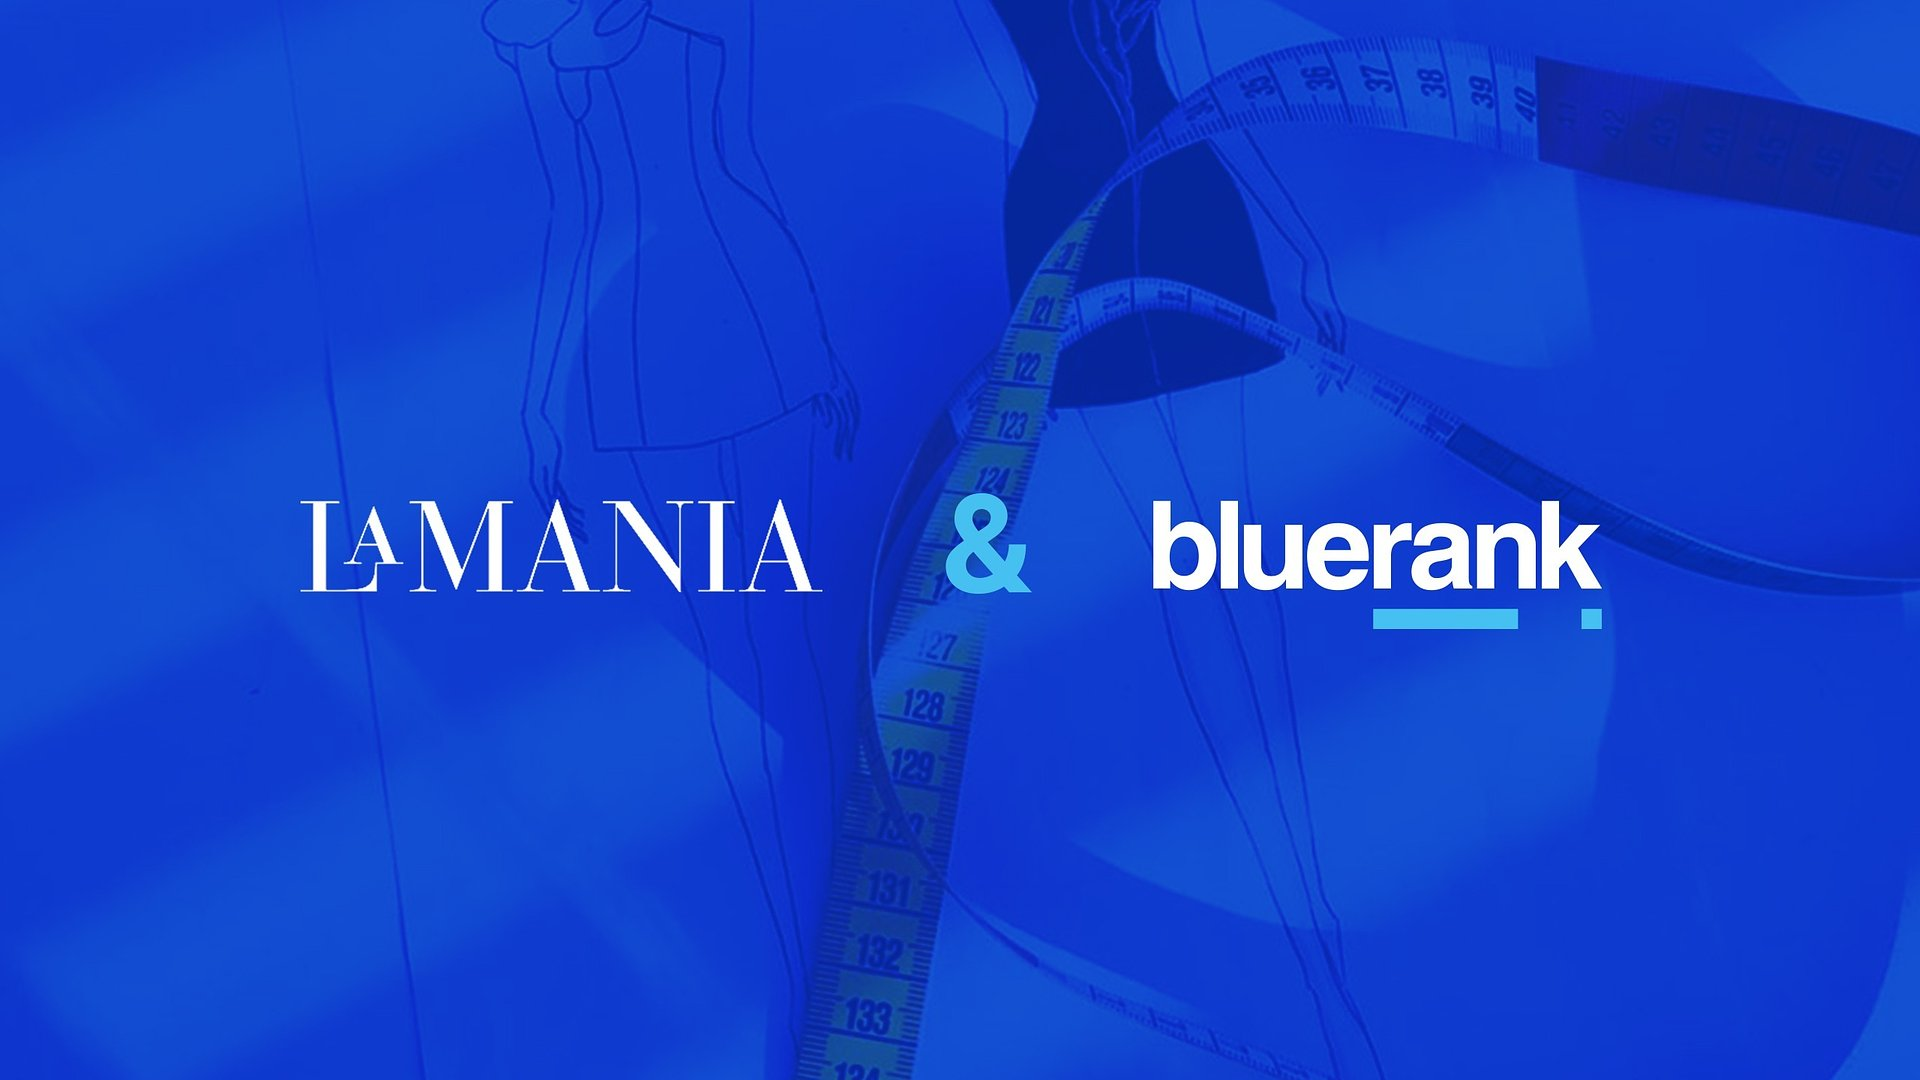 La Mania rozwija e-commerce ze wsparciem Bluerank